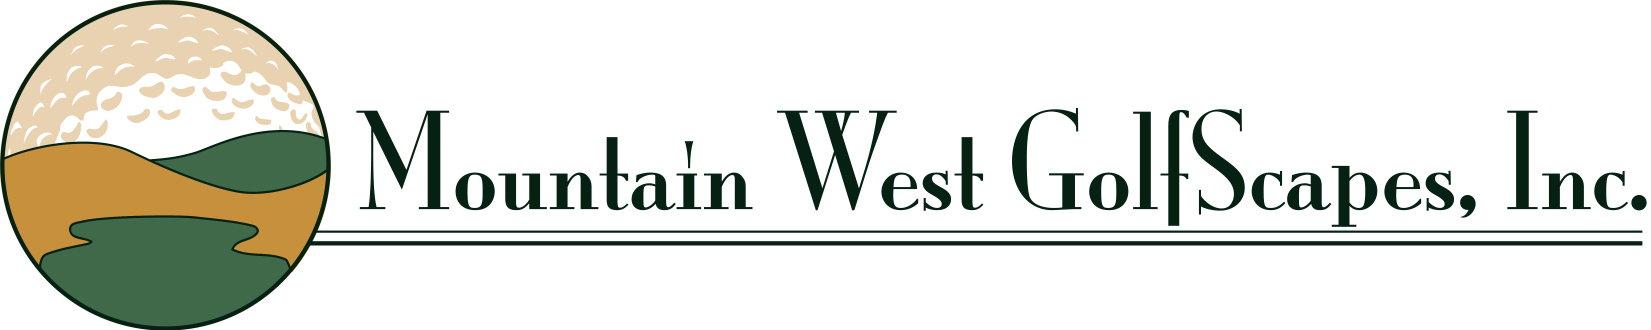 Mwg Logo Color (2).jpg